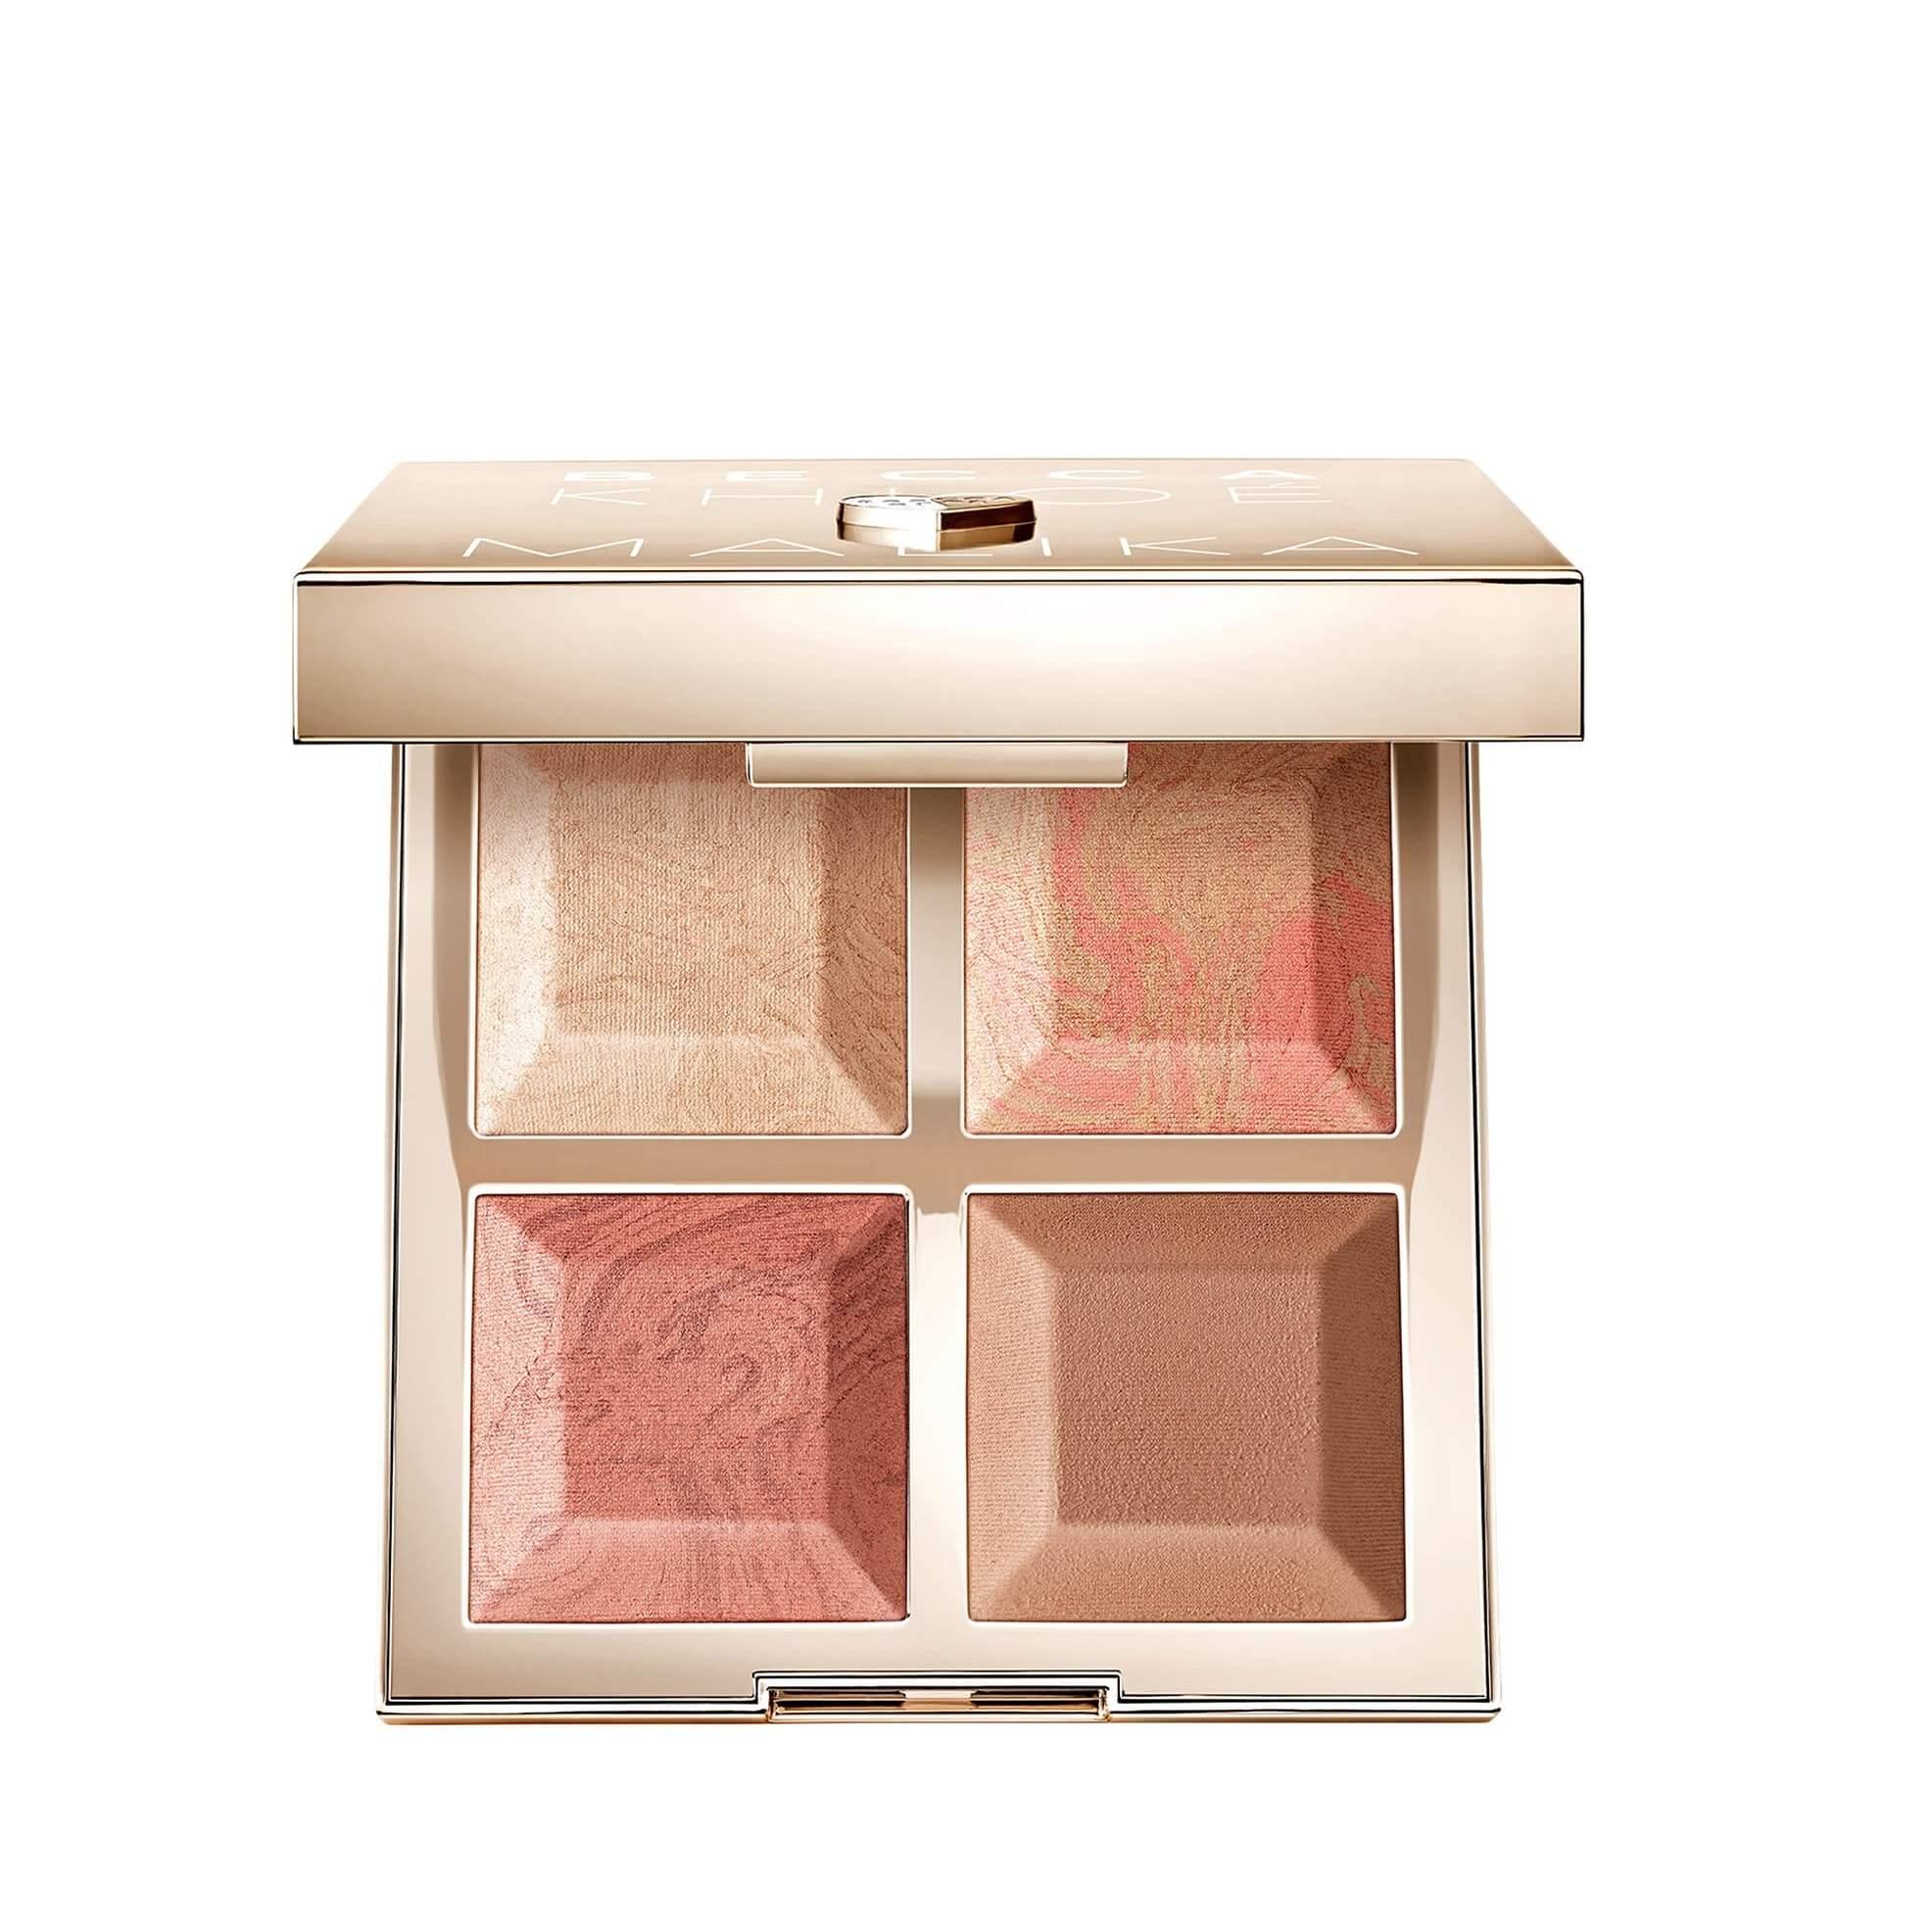 Paleta Becca x Khloe Kardashian Bronze, Blush & Glow BECCA